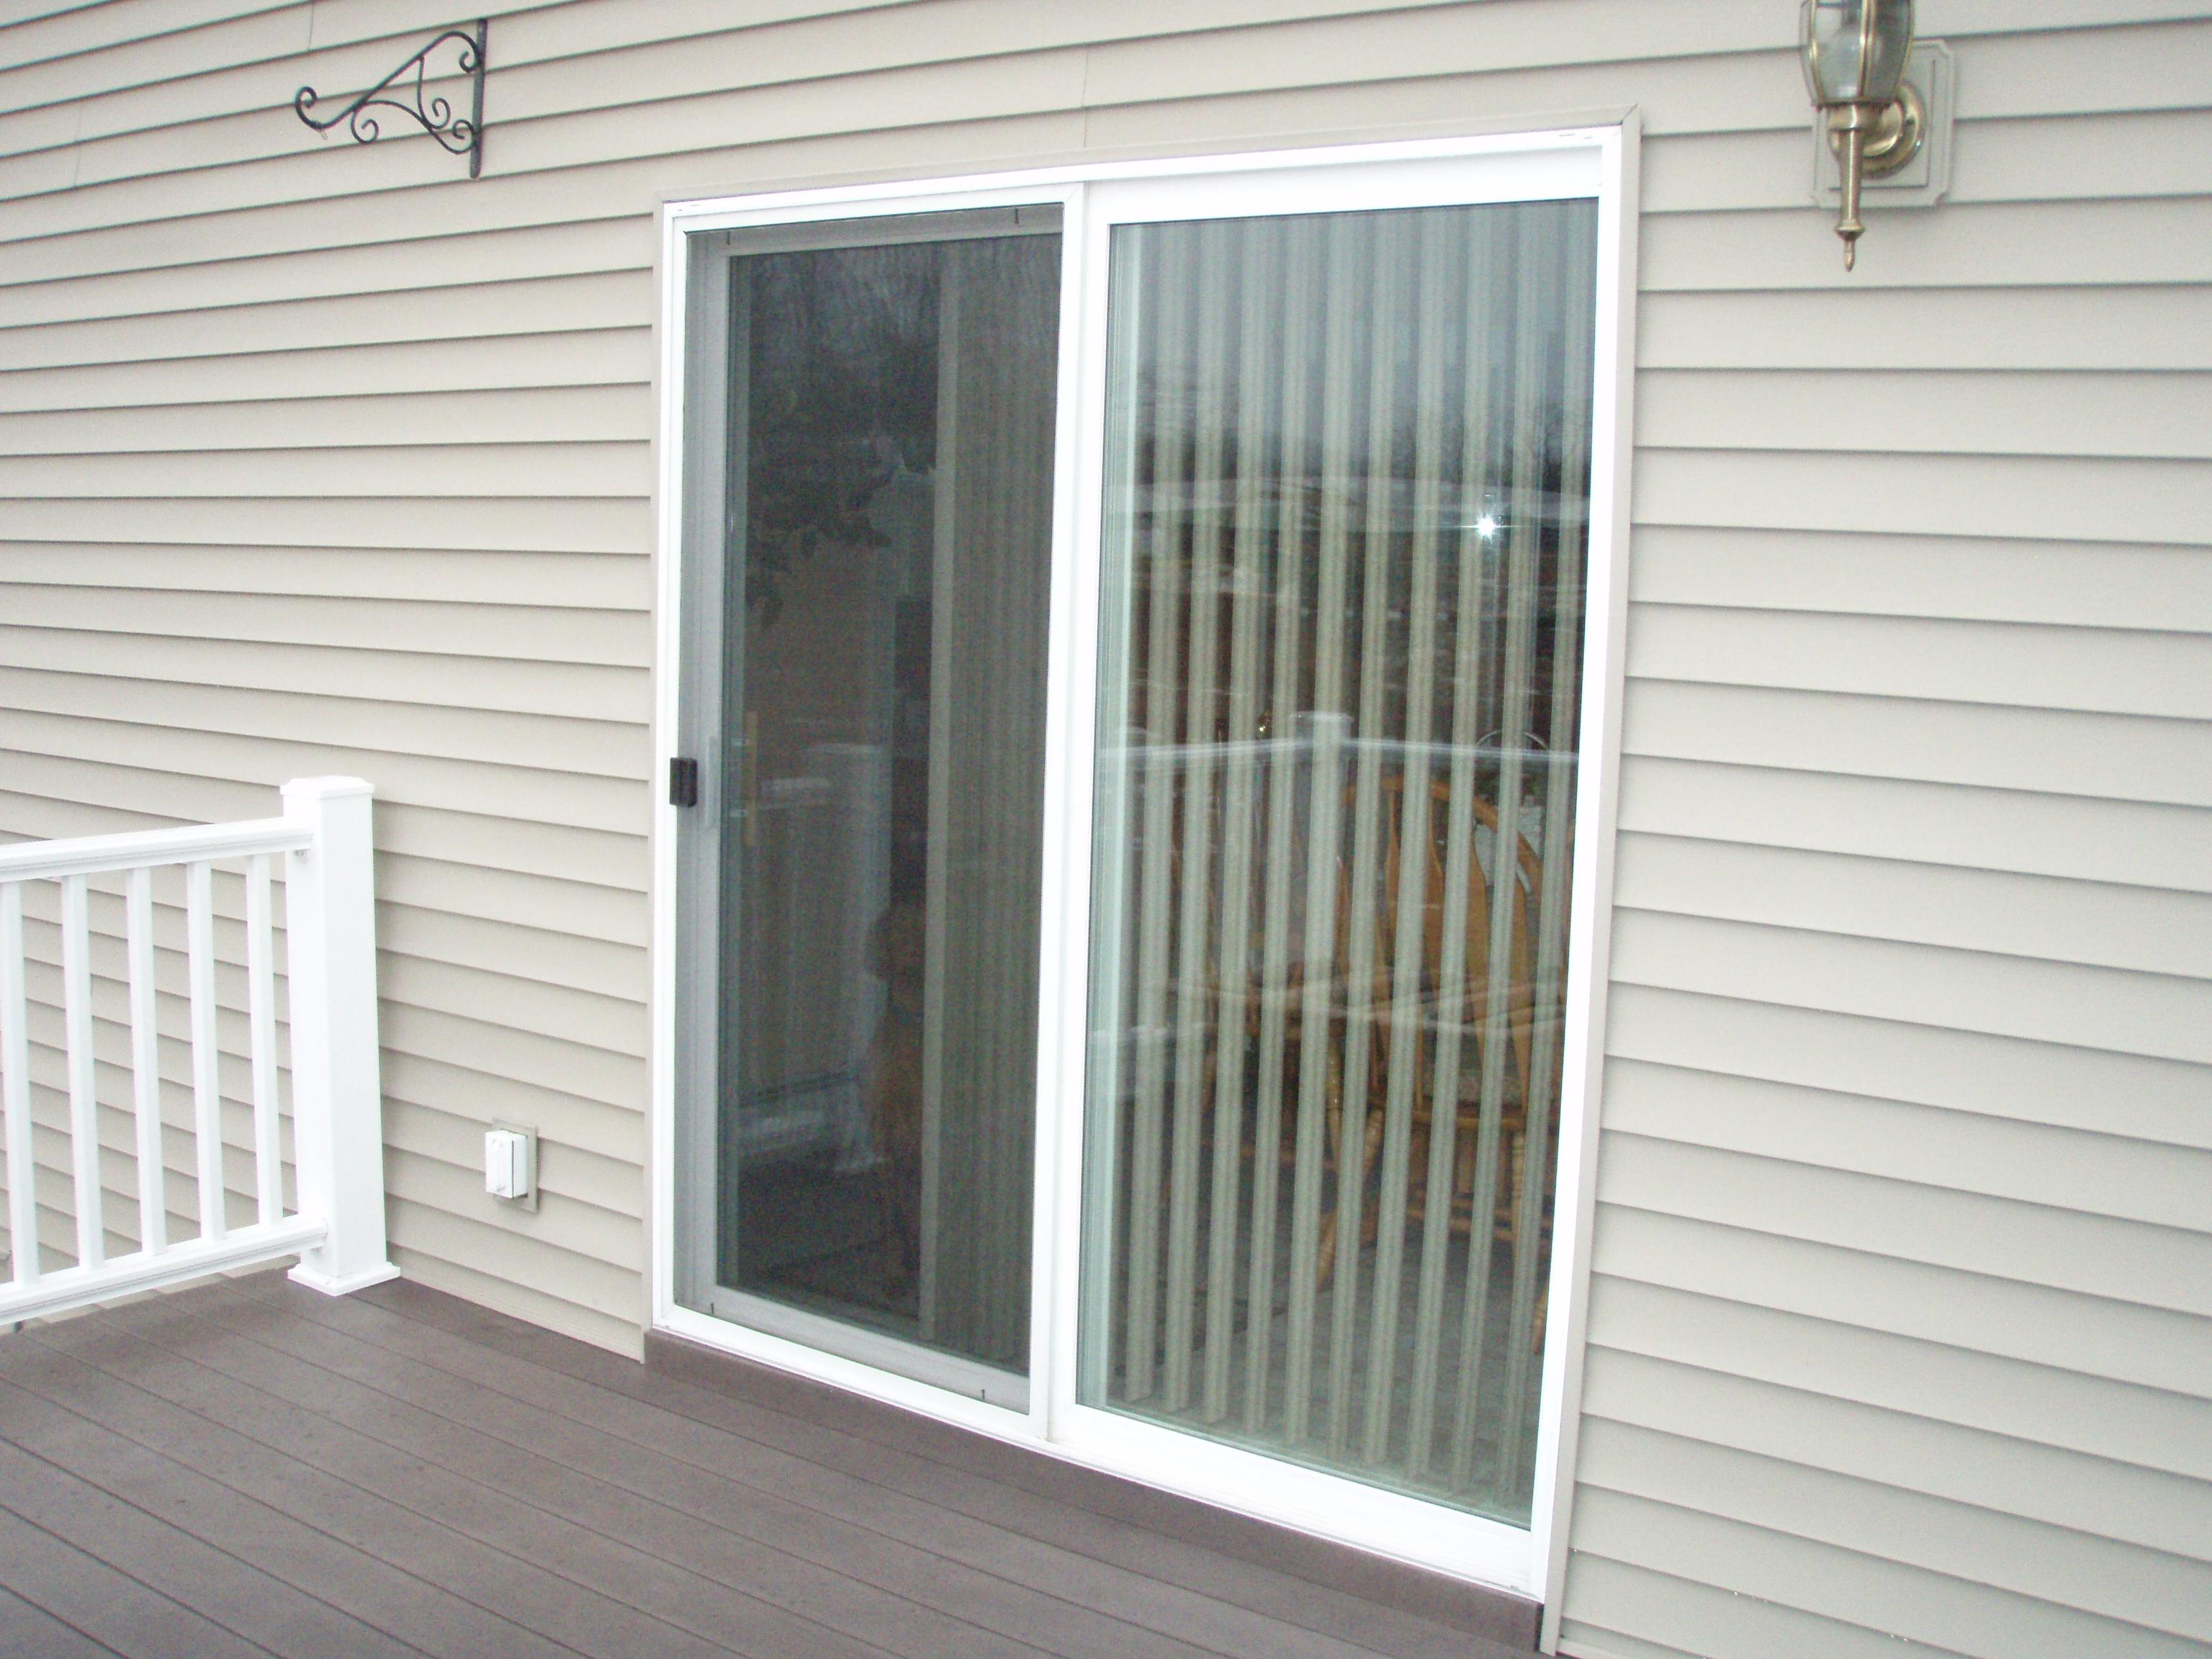 Mobile Home Sliding Glass Door3072 X 2304